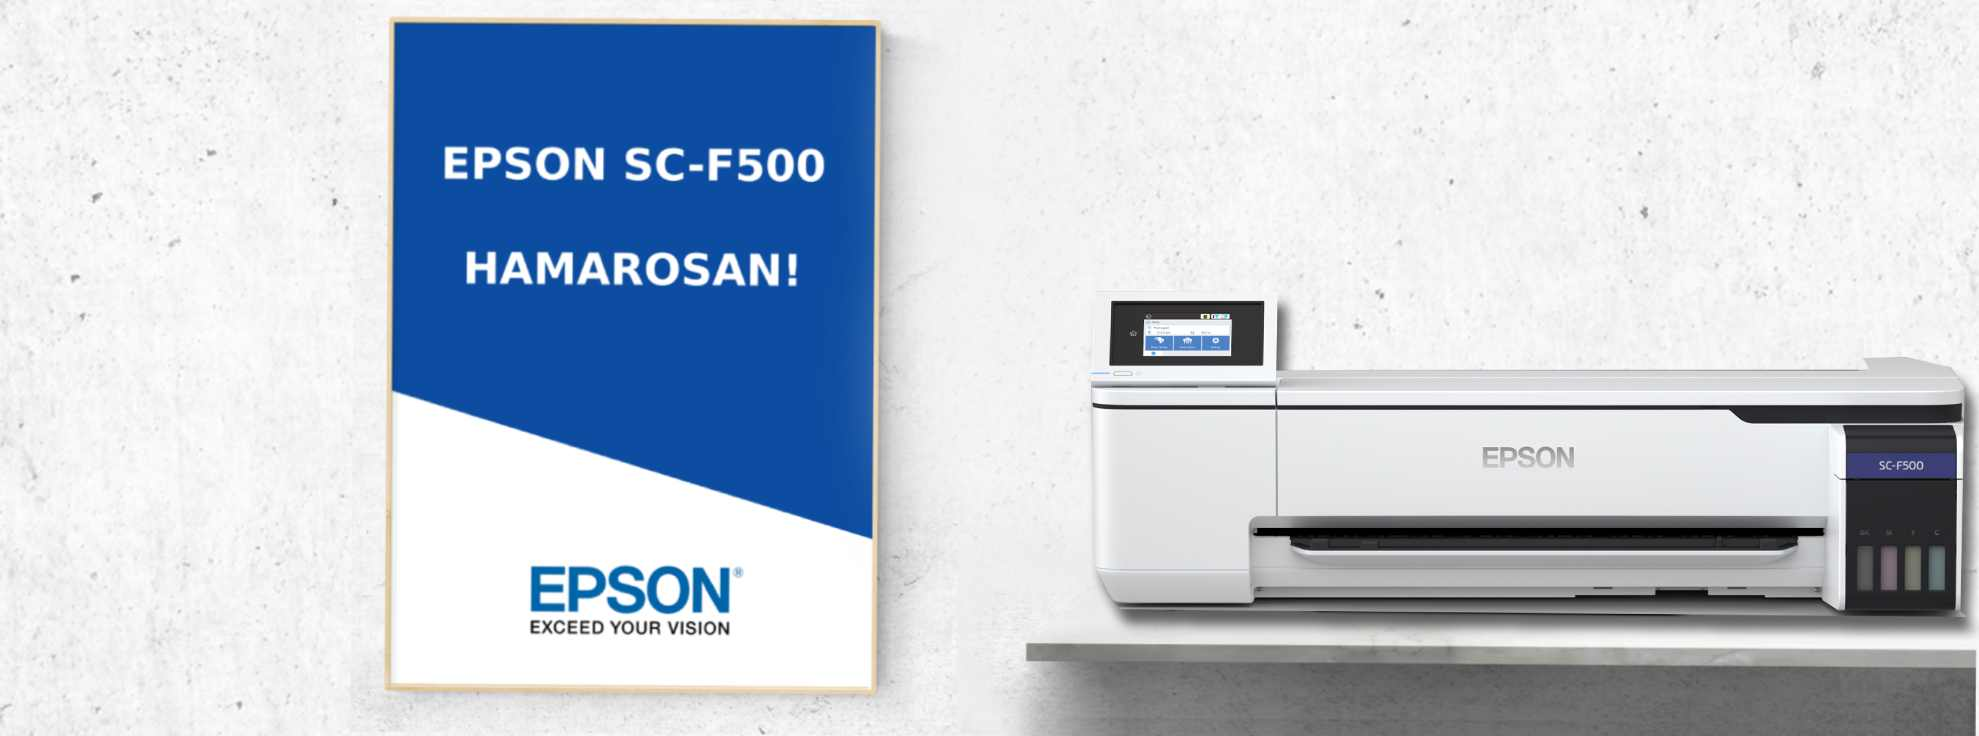 EPSON SC-F500 HAMAROSAN!